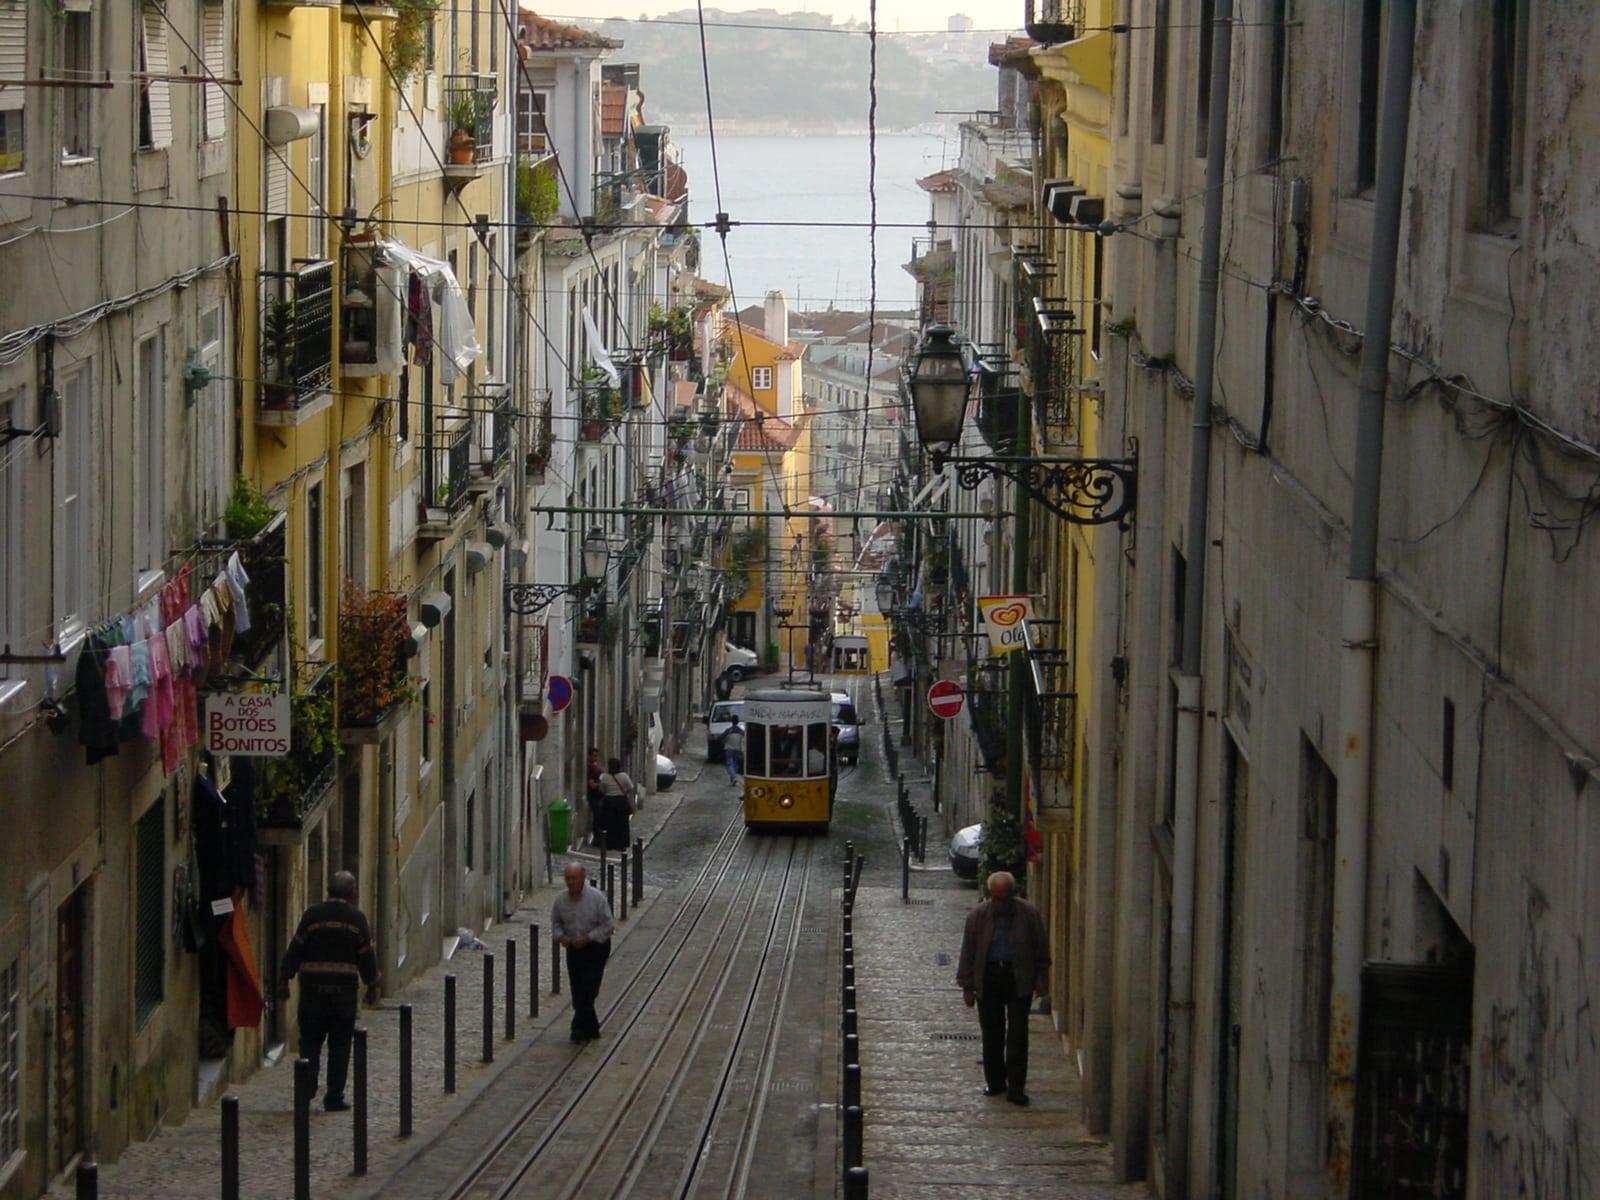 Portugal har de bedste strande på Algarvekysten